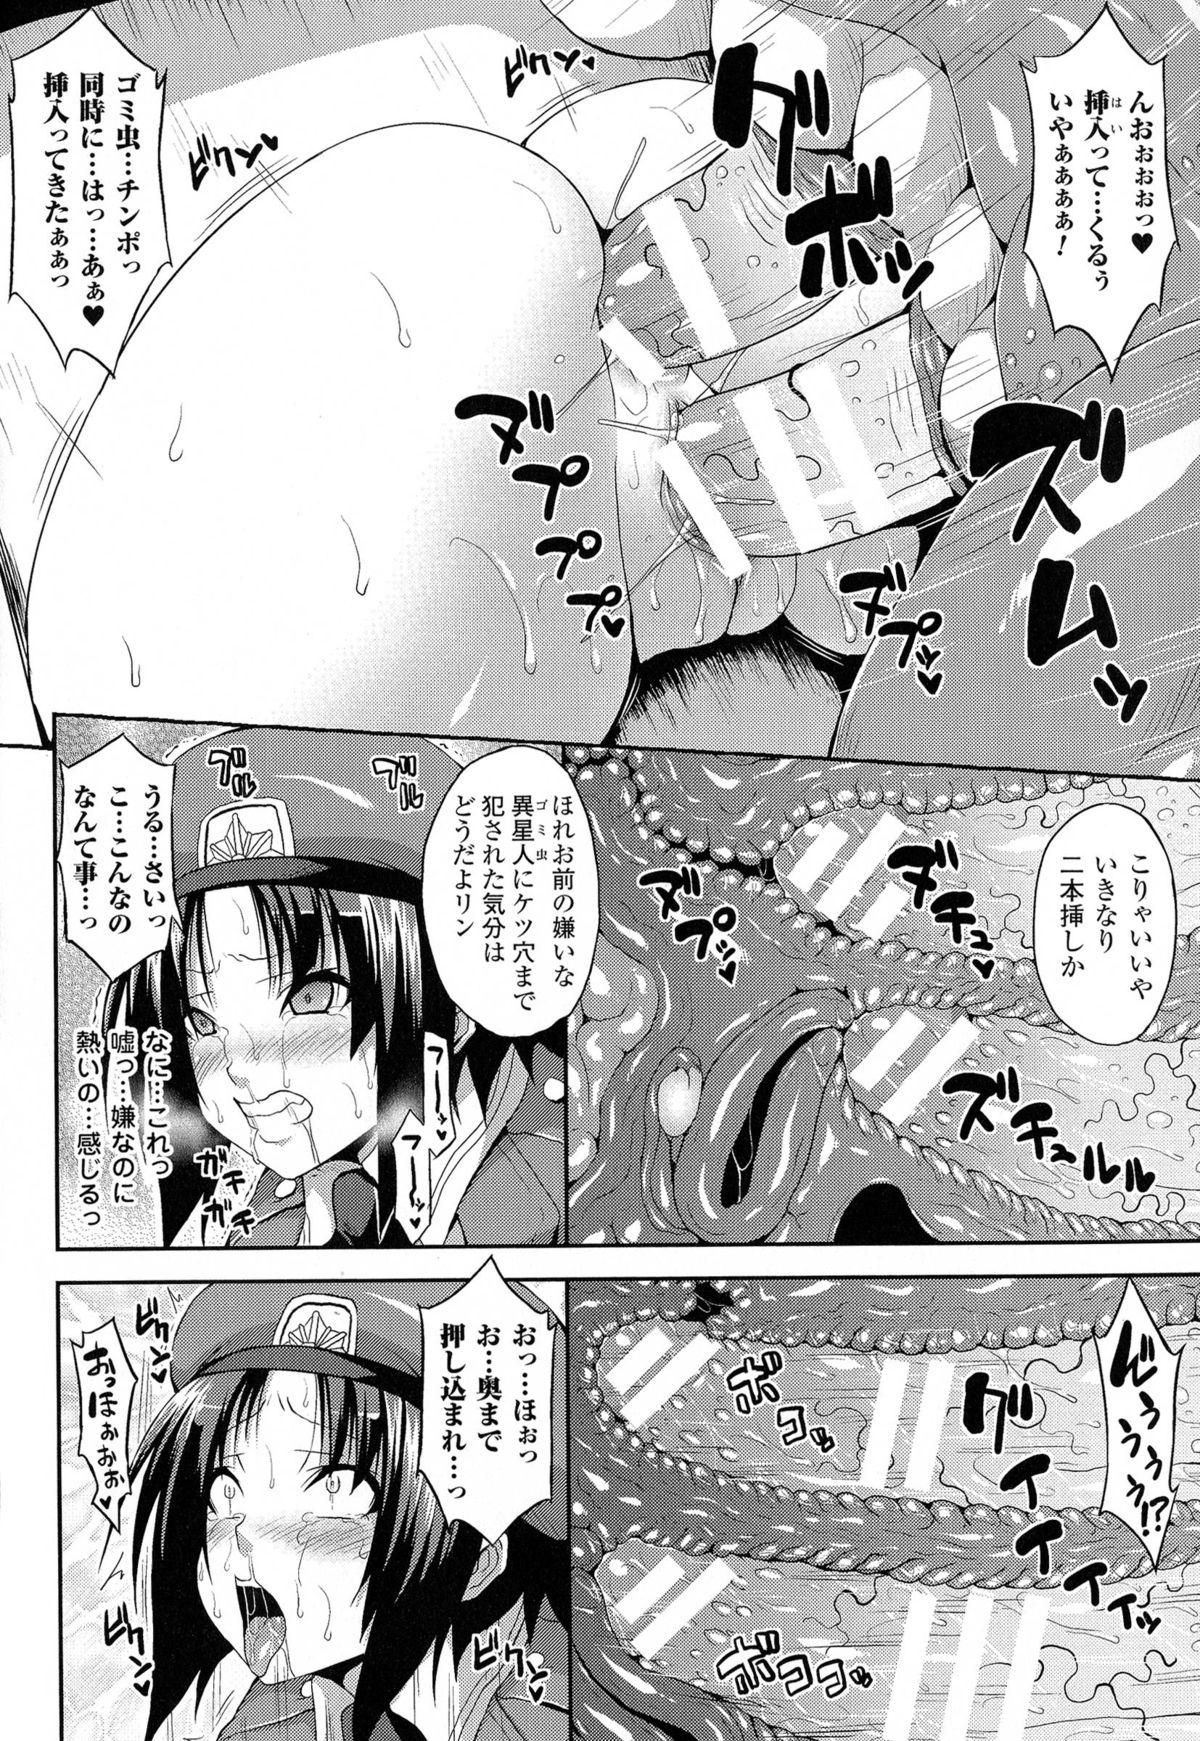 Angel Fall: Tengoku e to Ochiru Otome-tachi 79